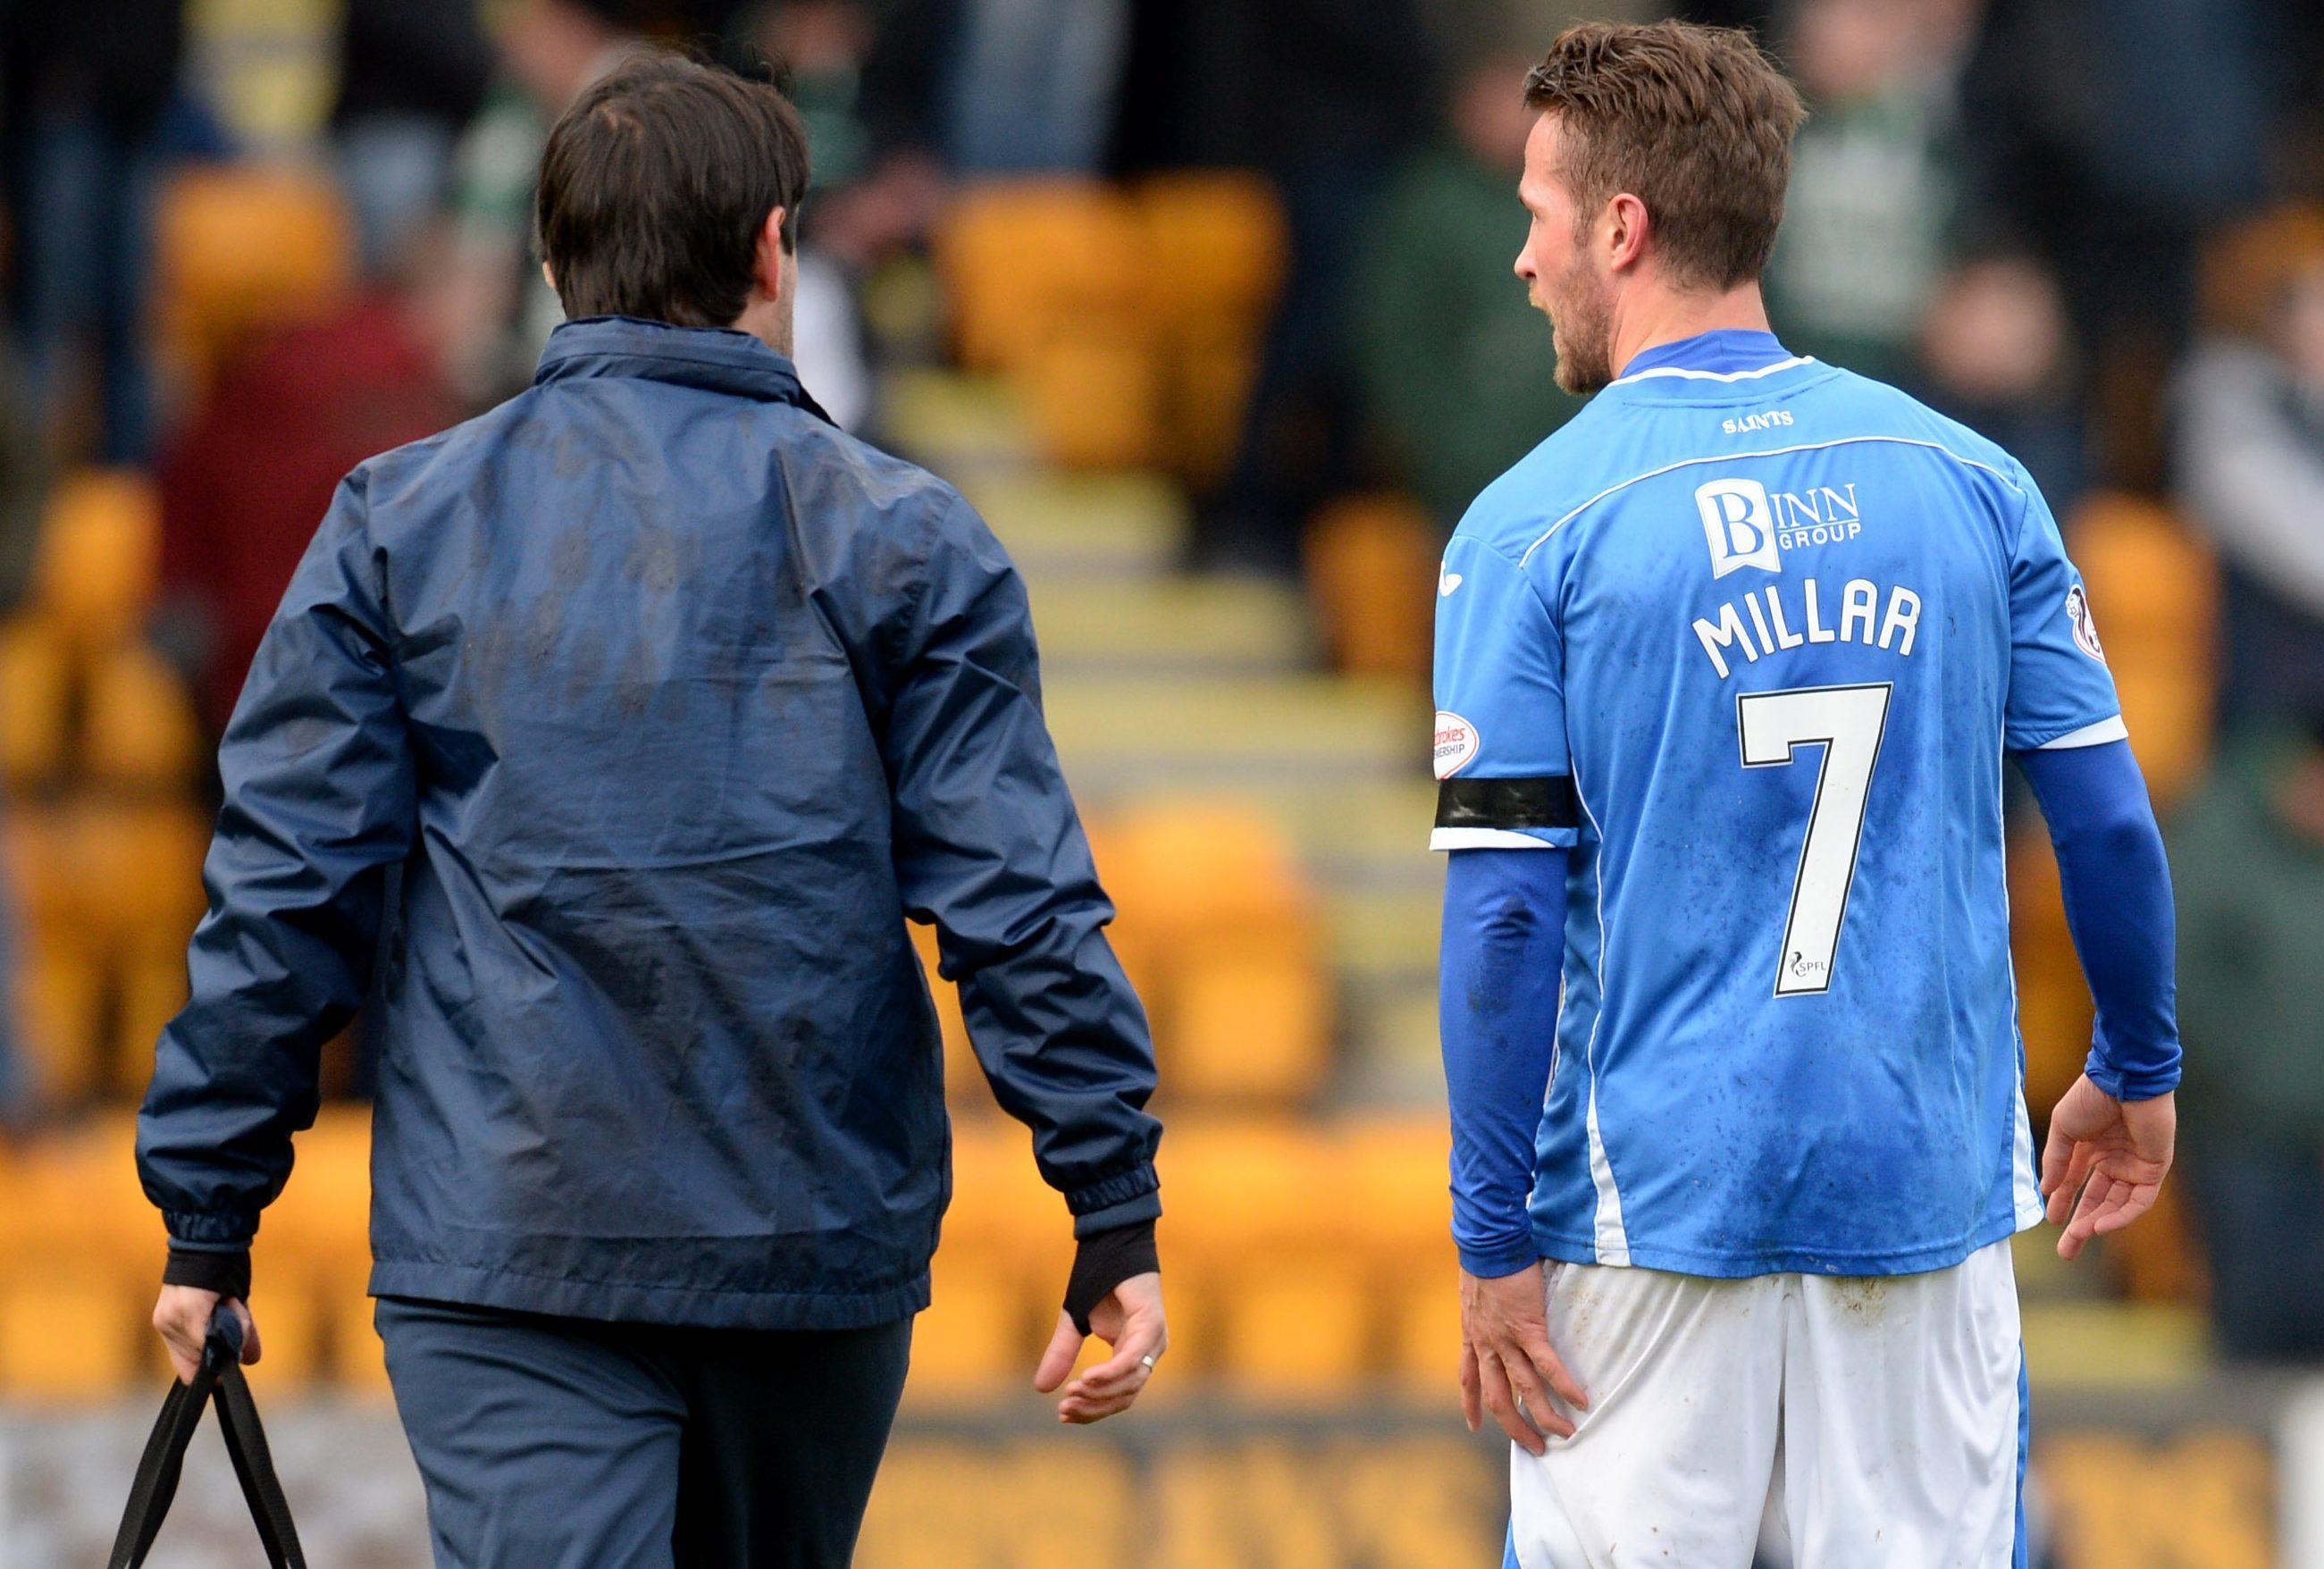 A familiar sight last season - Chris Millar trudging off the pitch.